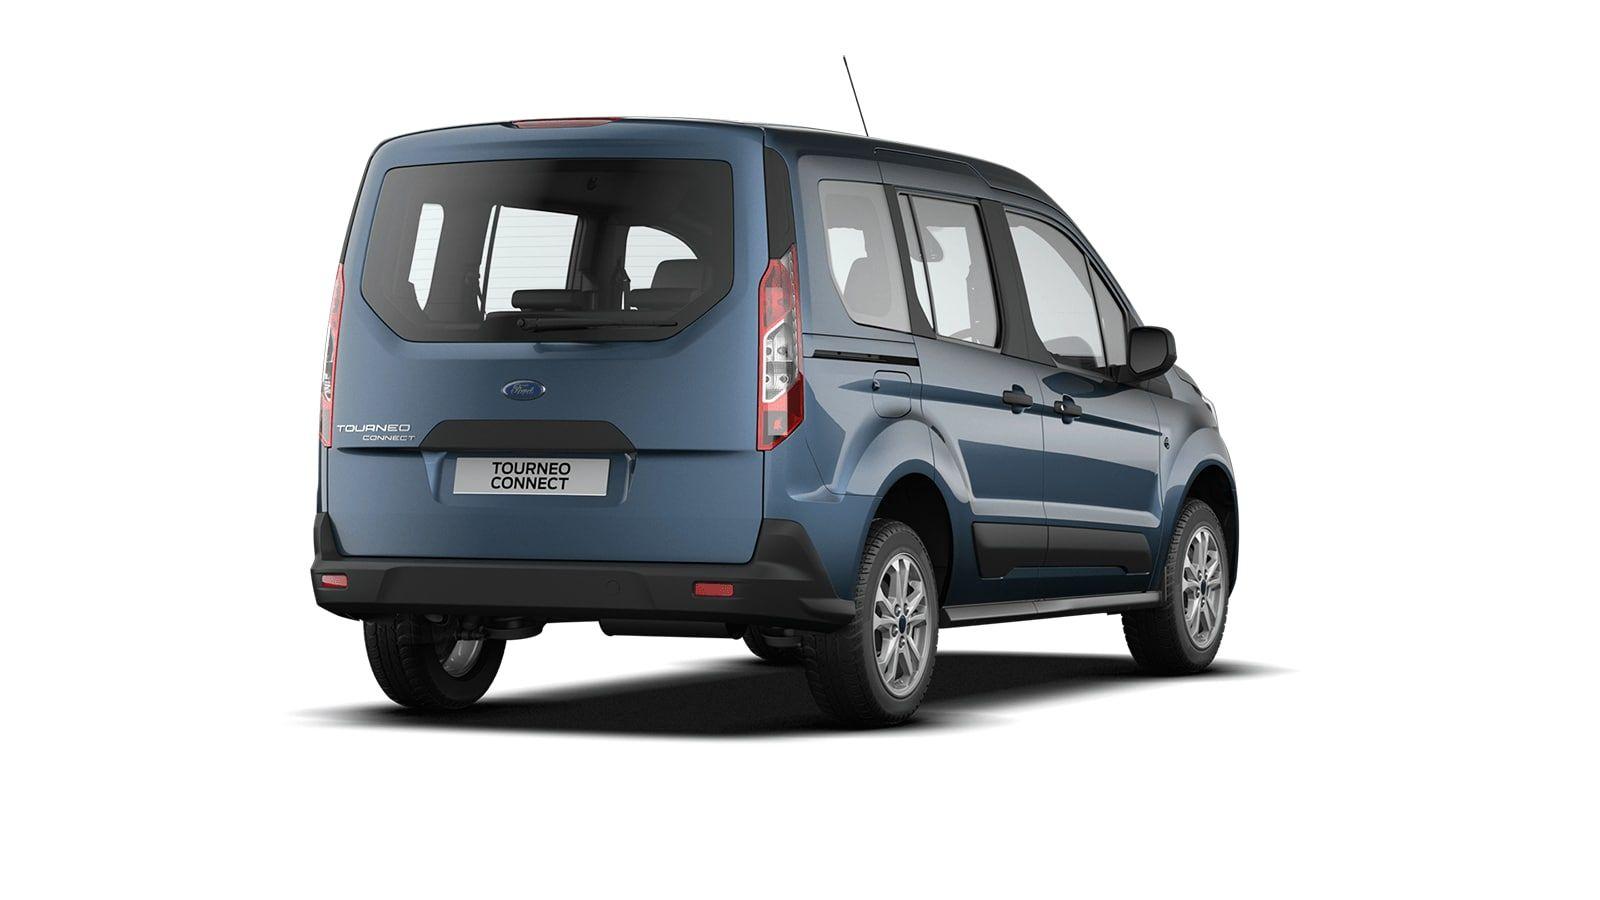 "Nieuw Ford Tourneo connect v408 Tourneo - Trend - 1.5 Duratorq TDCi 120ps / 88kW (270Nm) A8 US5 - Niet-metaalkleur ""Frozen White"" 3"